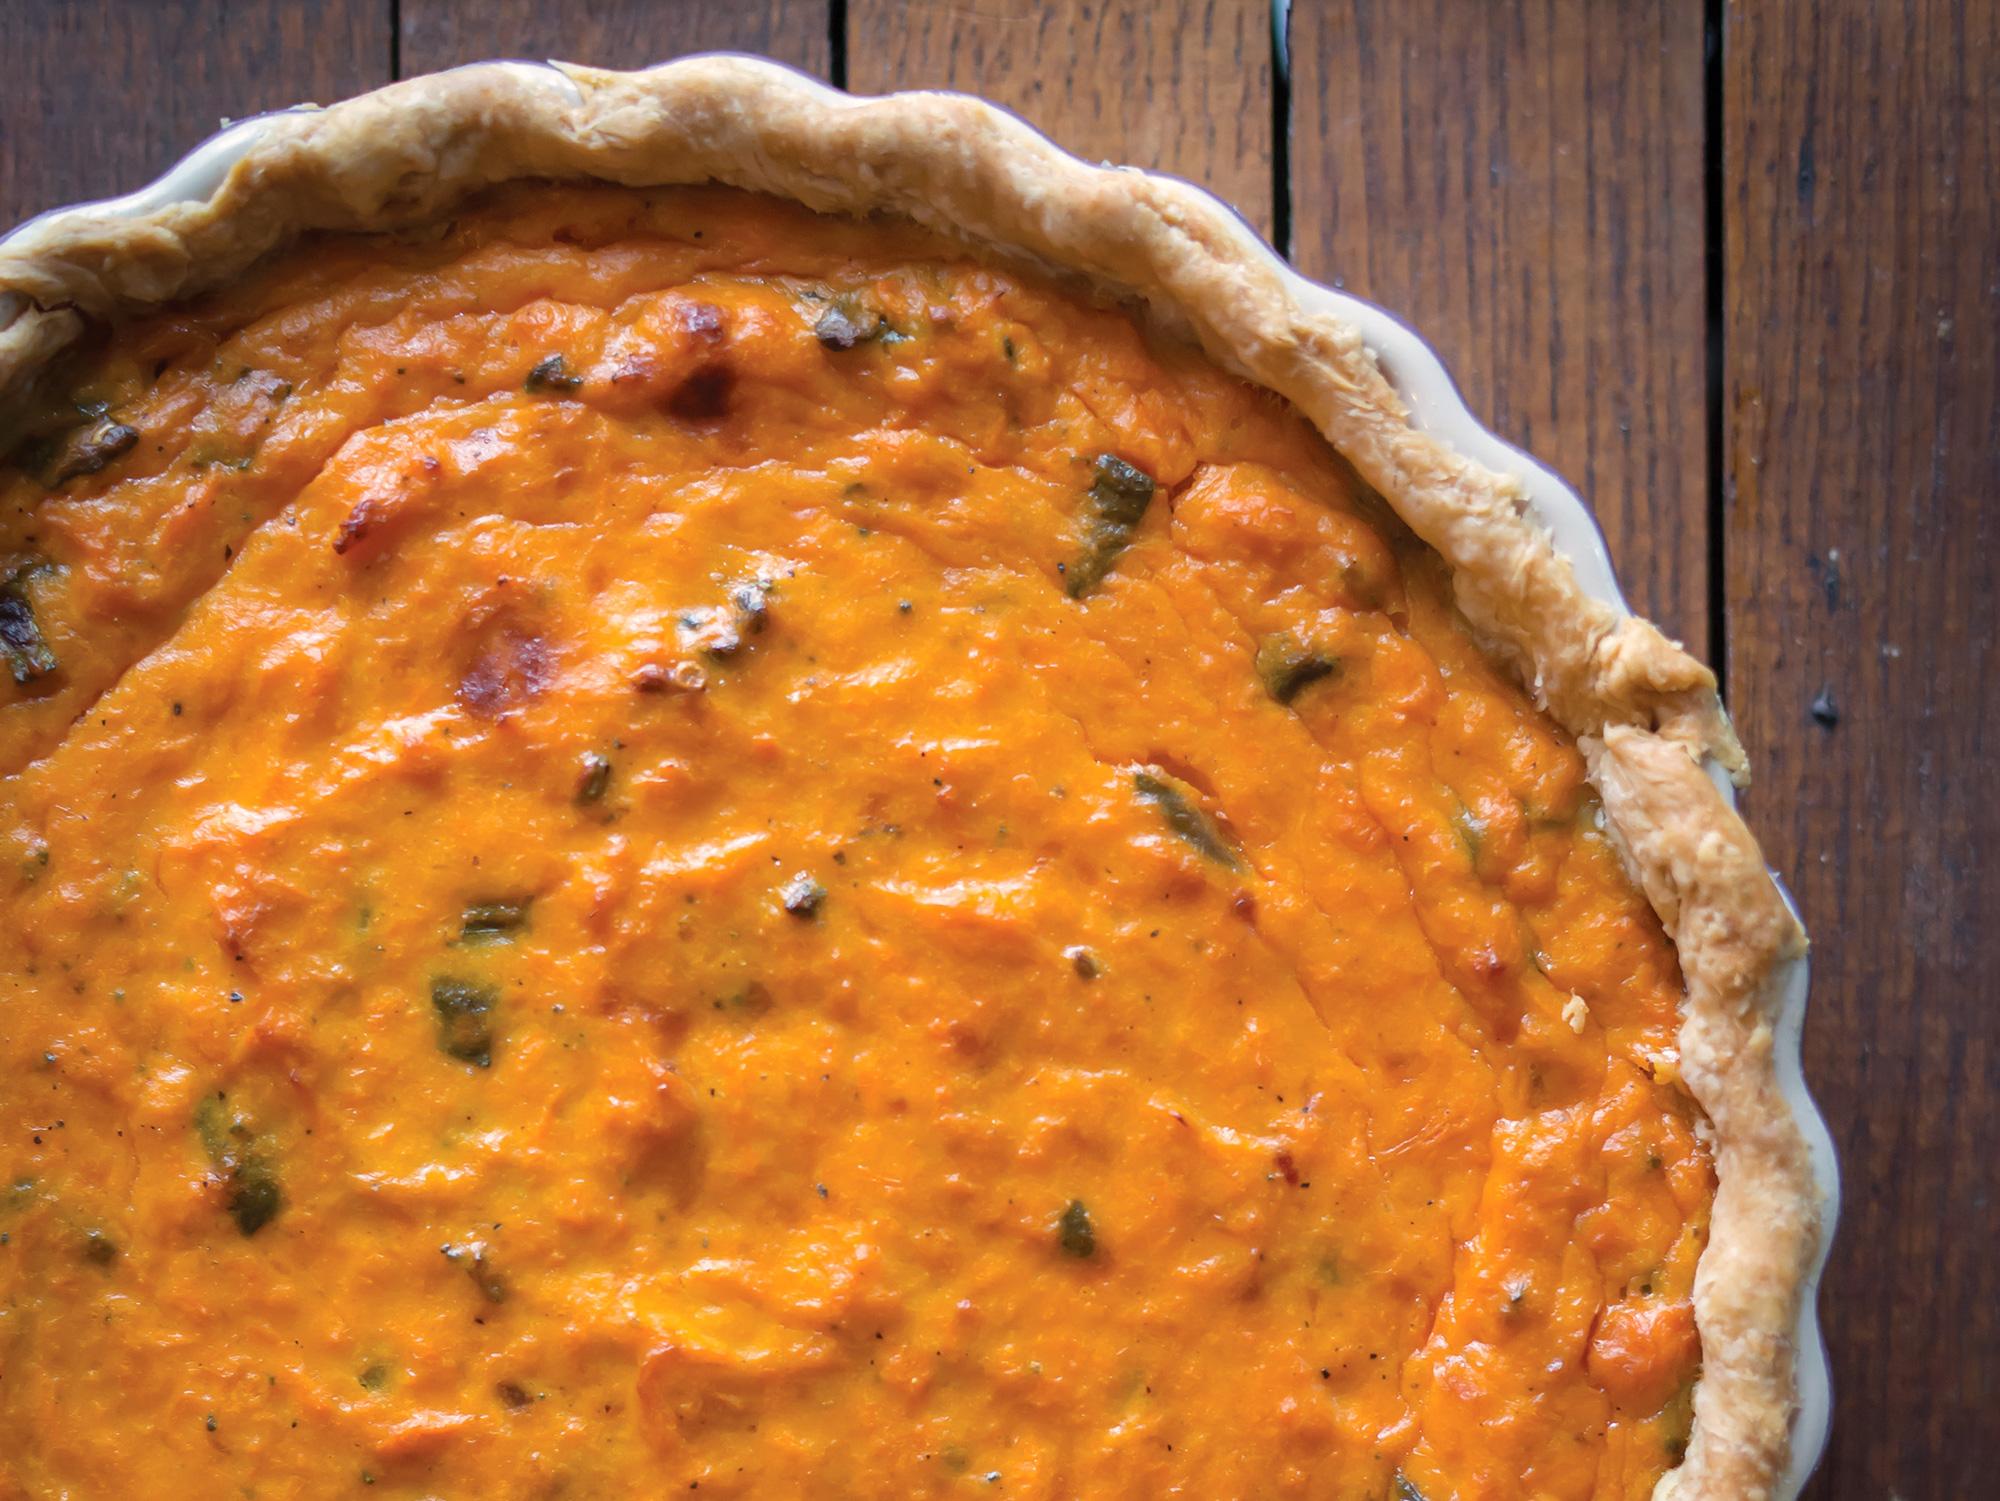 Savory Sweet Potato Pie Recipe - Peg's Home Cooking